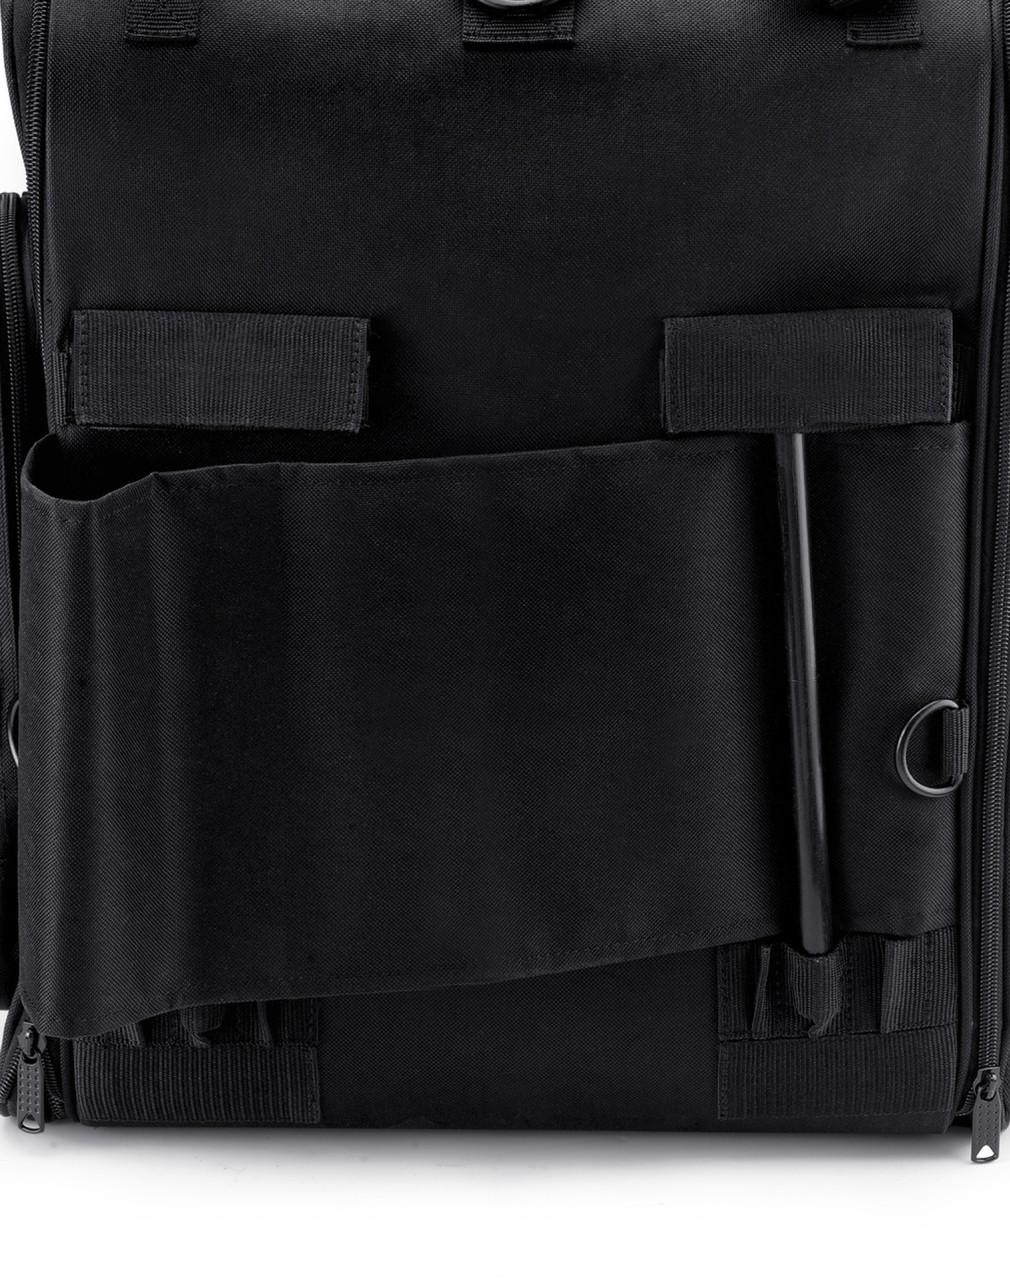 Suzuki Viking Extra Large Studded Motorcycle Tail Bag Back Side View